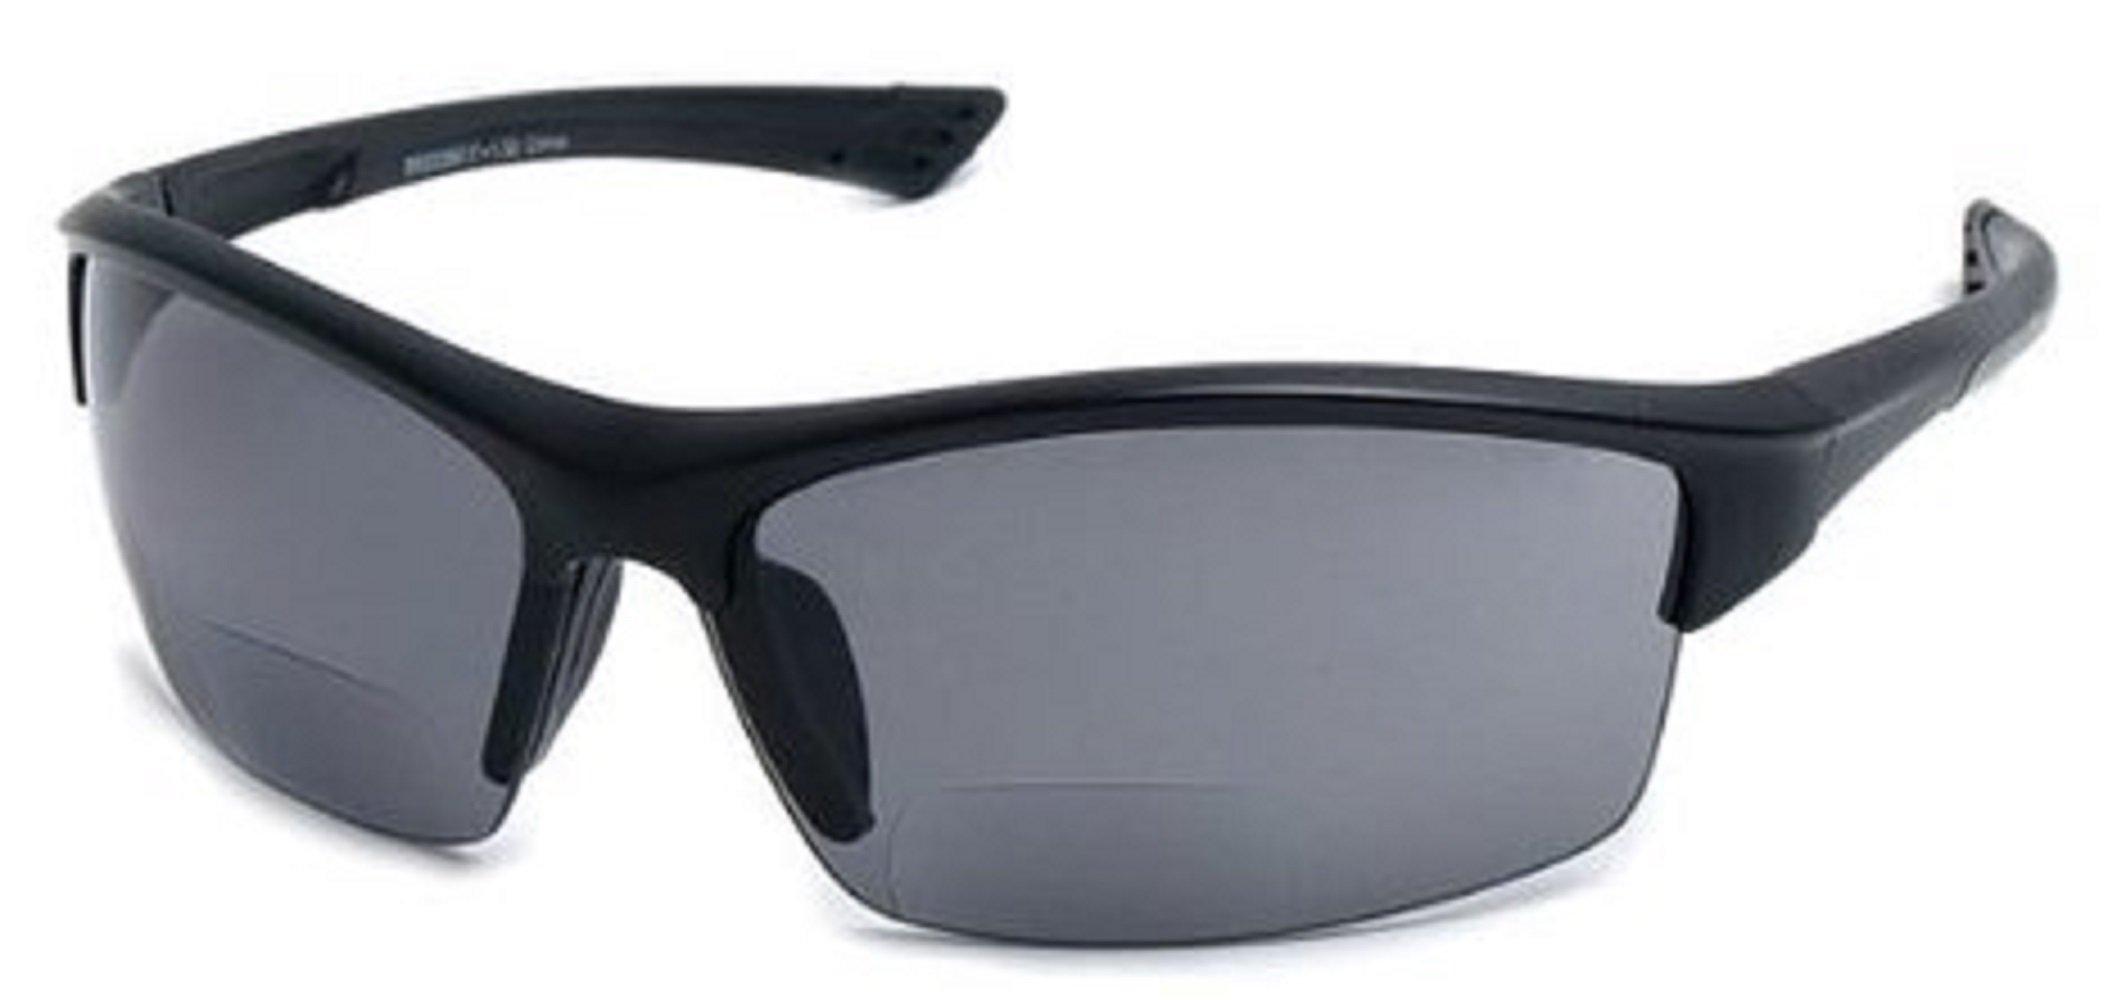 Bifocal Reading Sunglasses Microfiber Included